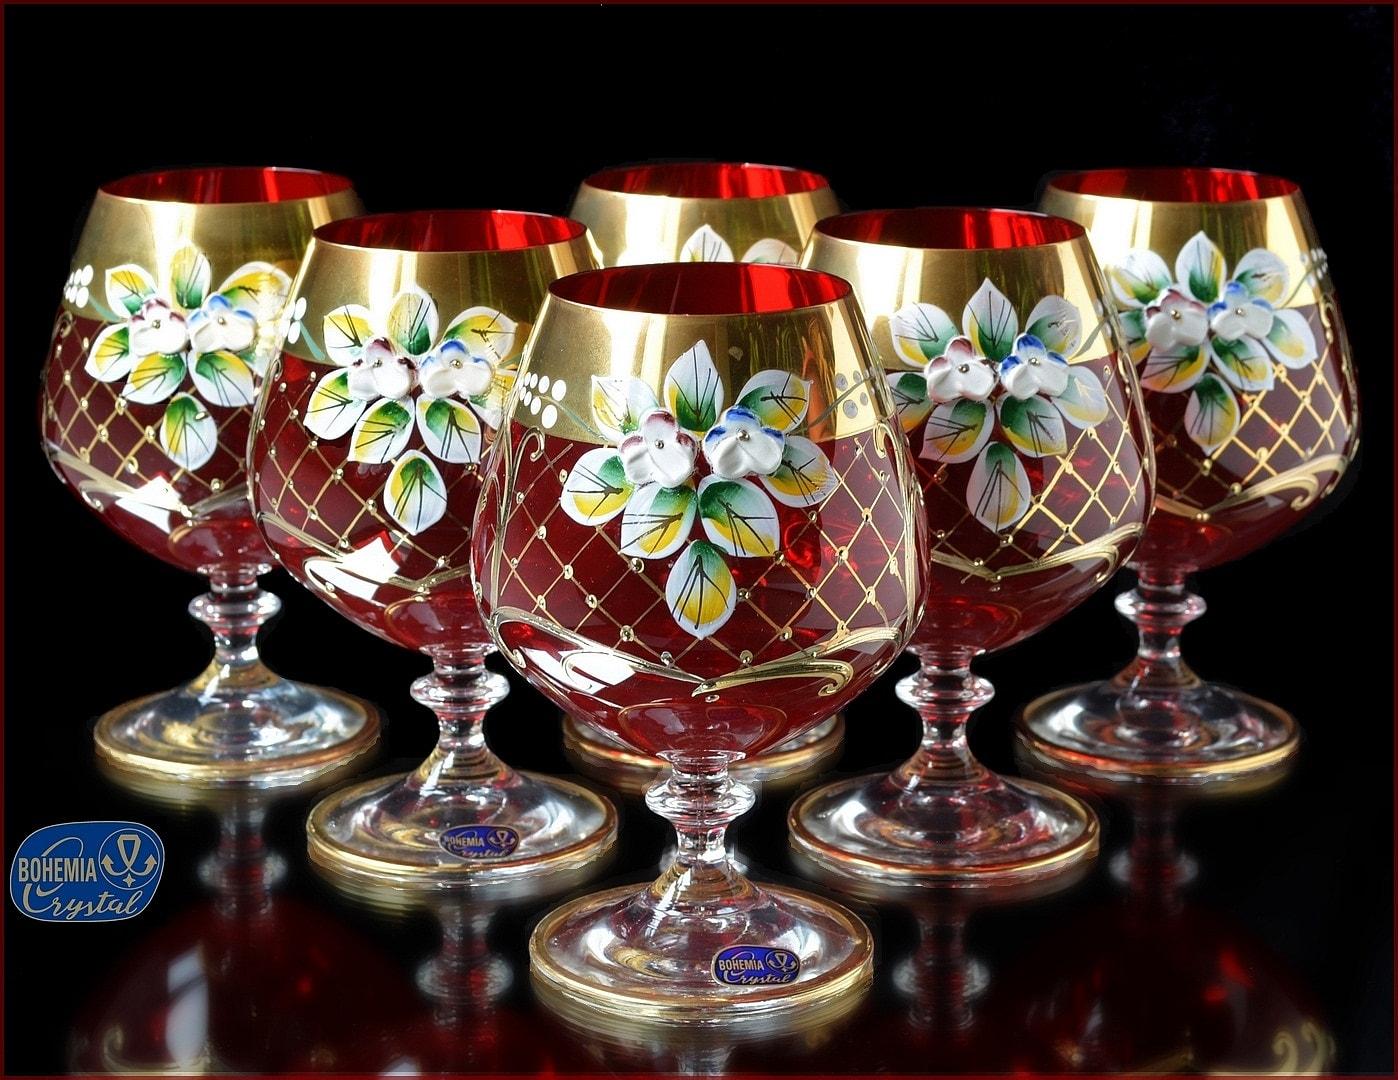 bohemia crystal aleks-crystal.com/en/